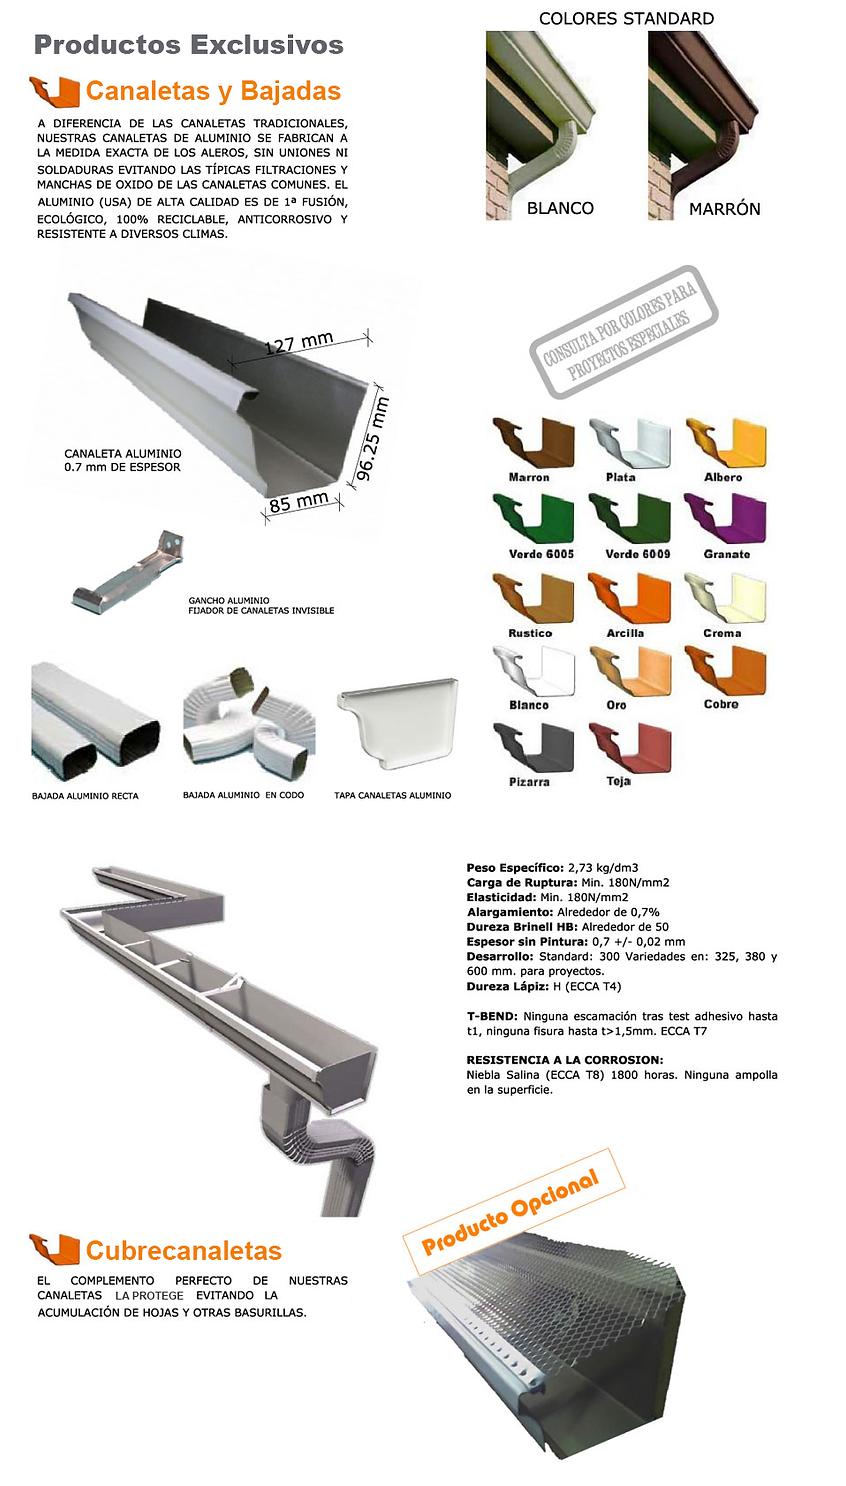 pagina-productos-completa.png